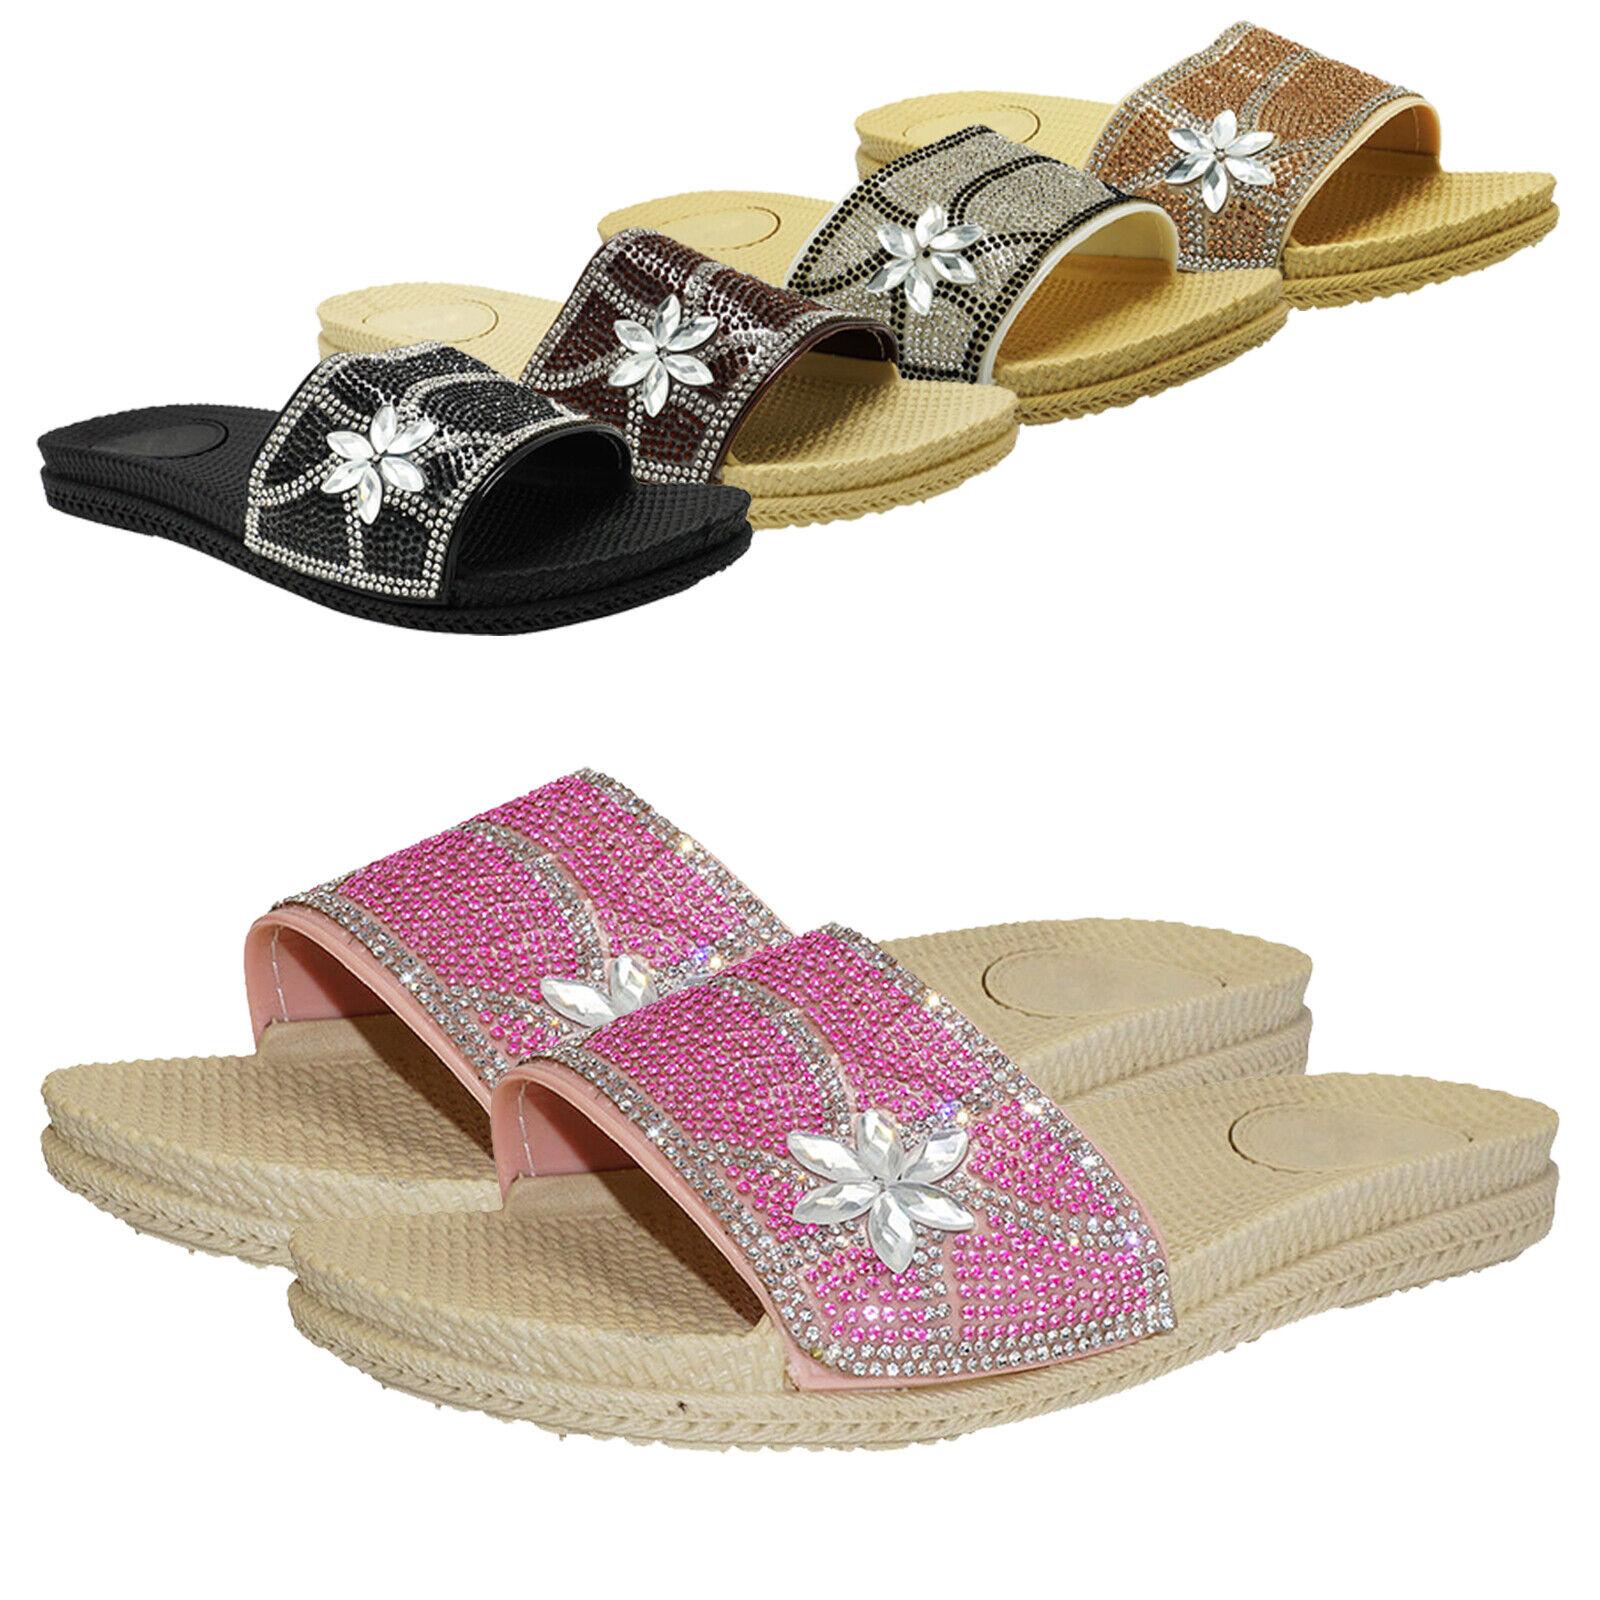 Womens Rhinestone Glitter Crystal Slippers Flatform Platform Beach Slide Sandals